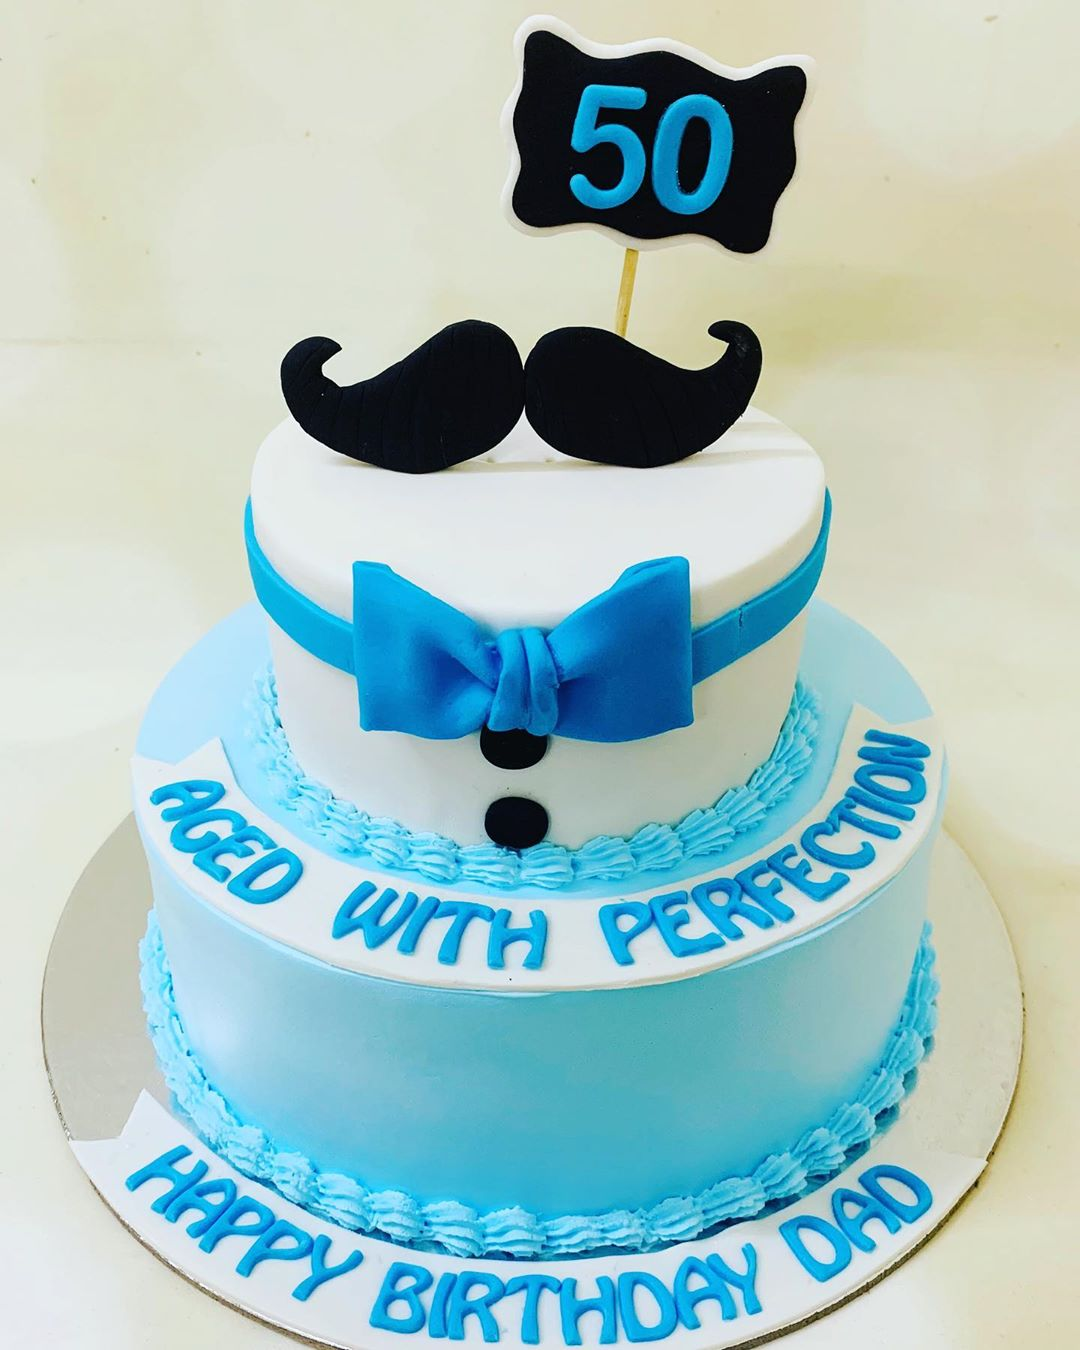 Sensational 2 Tier Fathers Birthday Cake Funny Birthday Cards Online Bapapcheapnameinfo